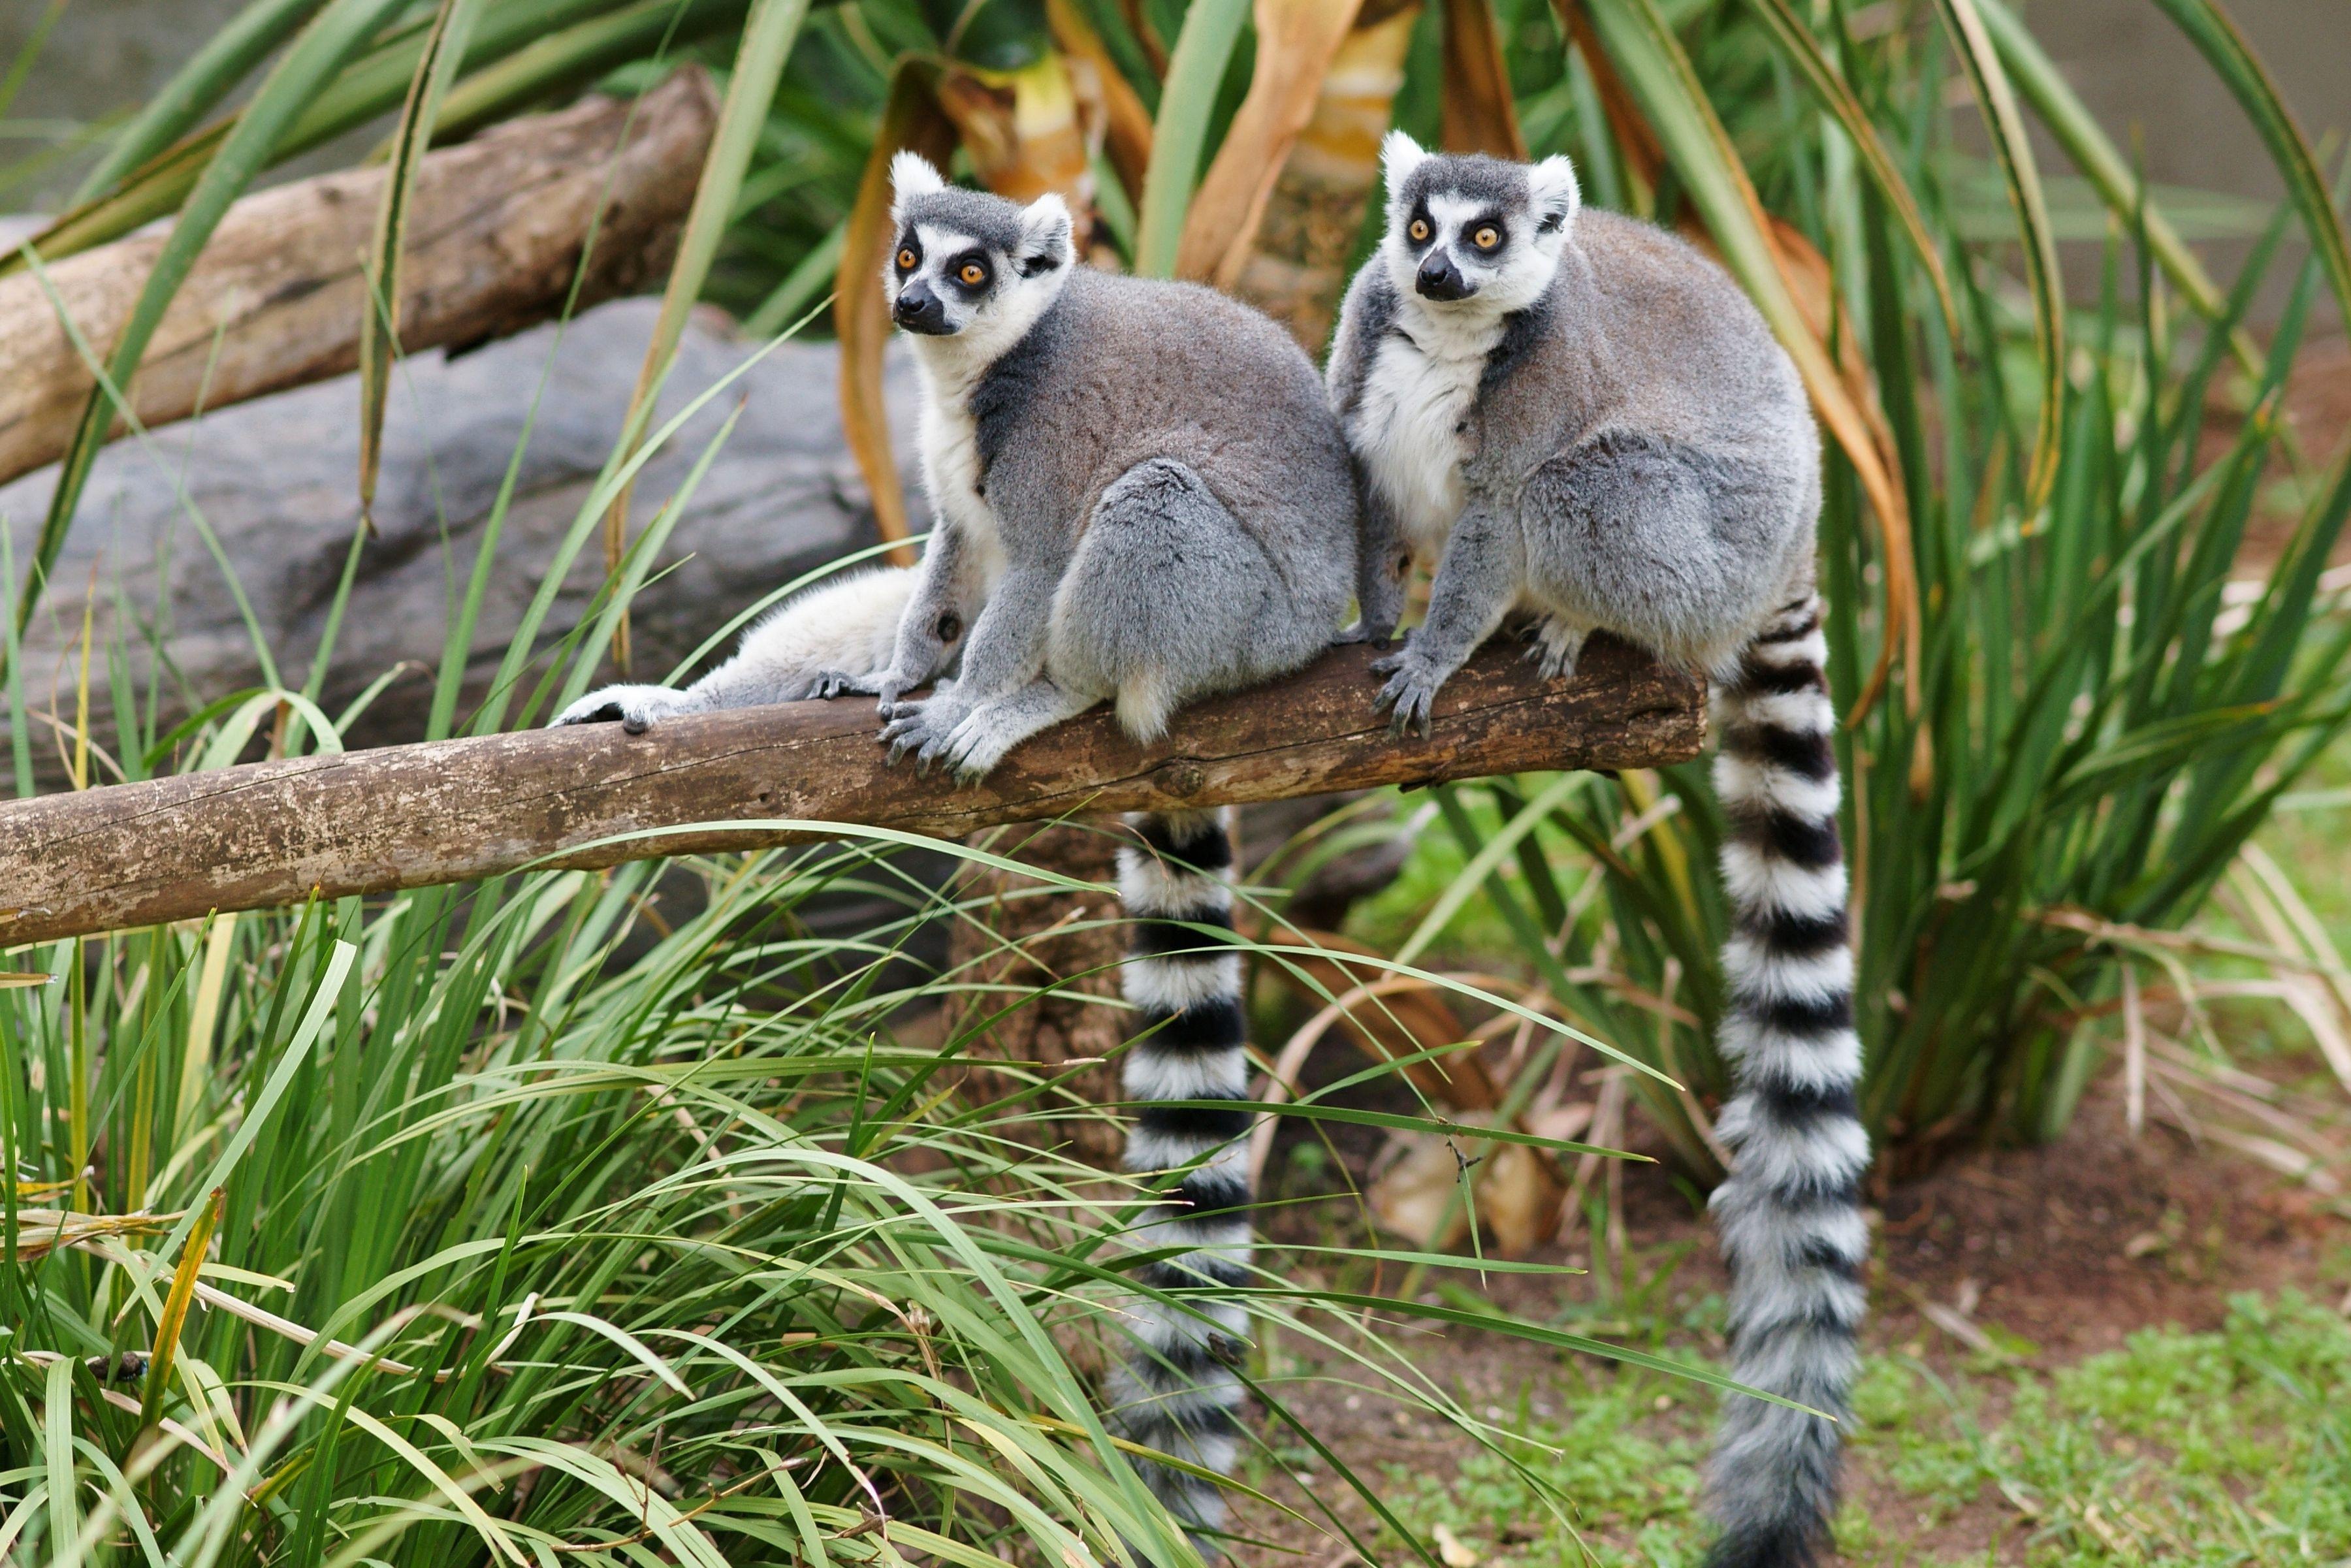 Top Lemur Wallpaper - 406400  Trends_694039.jpg